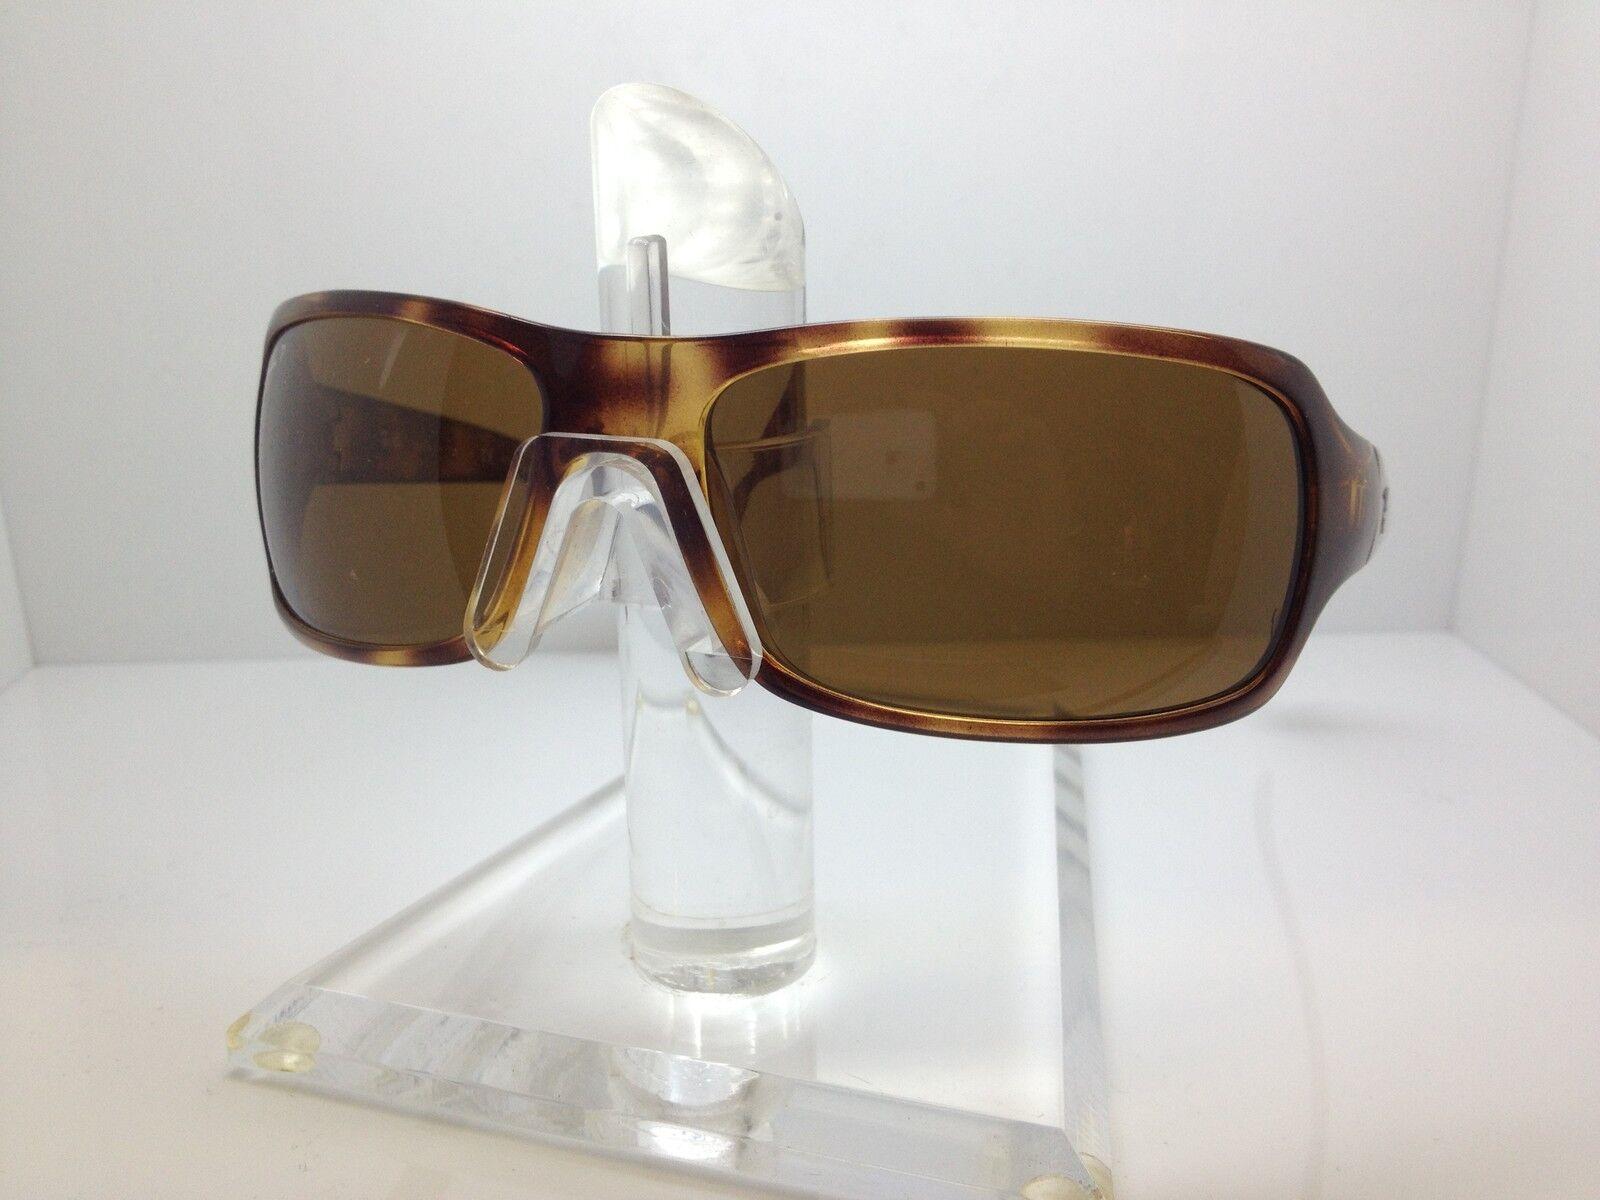 2ec2d37554 ... clearance ray ban rb8302 tech sunglasses black frame crystal green  631f6 23d0b